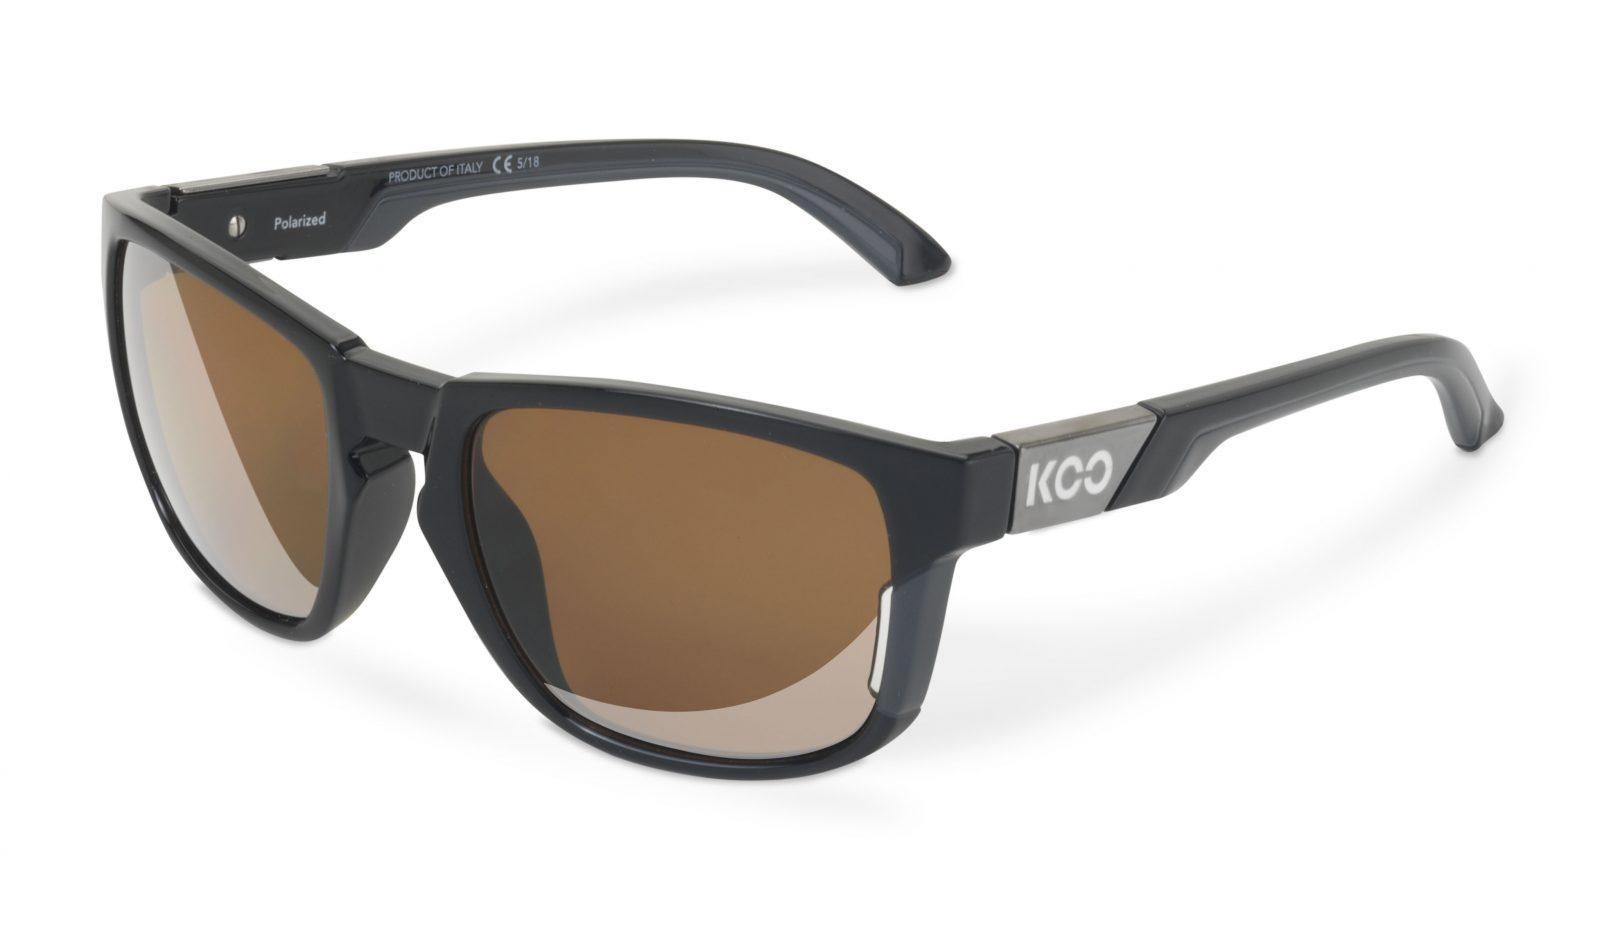 543c555bb2d Koo CALIFORNIA Casual   Lifestyle Sunglasses   POLARIZED - 700